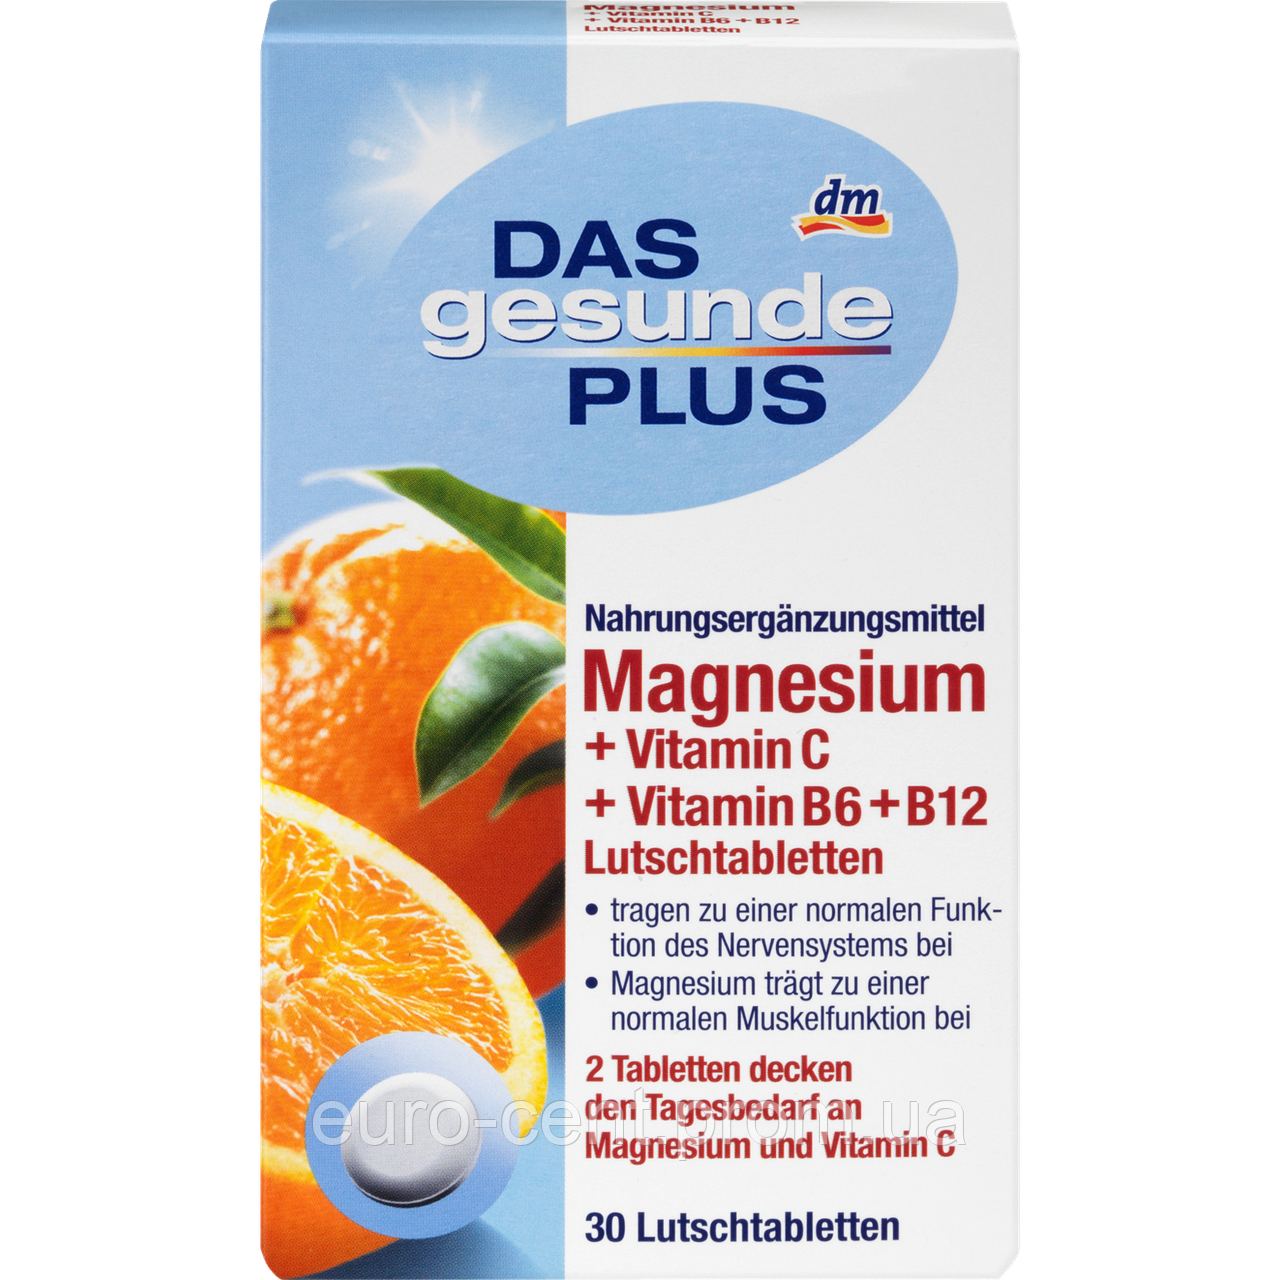 Магнезия + Витамин C + Витамин B6 + B12 леденцы-пастилки, Das gesunde Plus, 30 шт